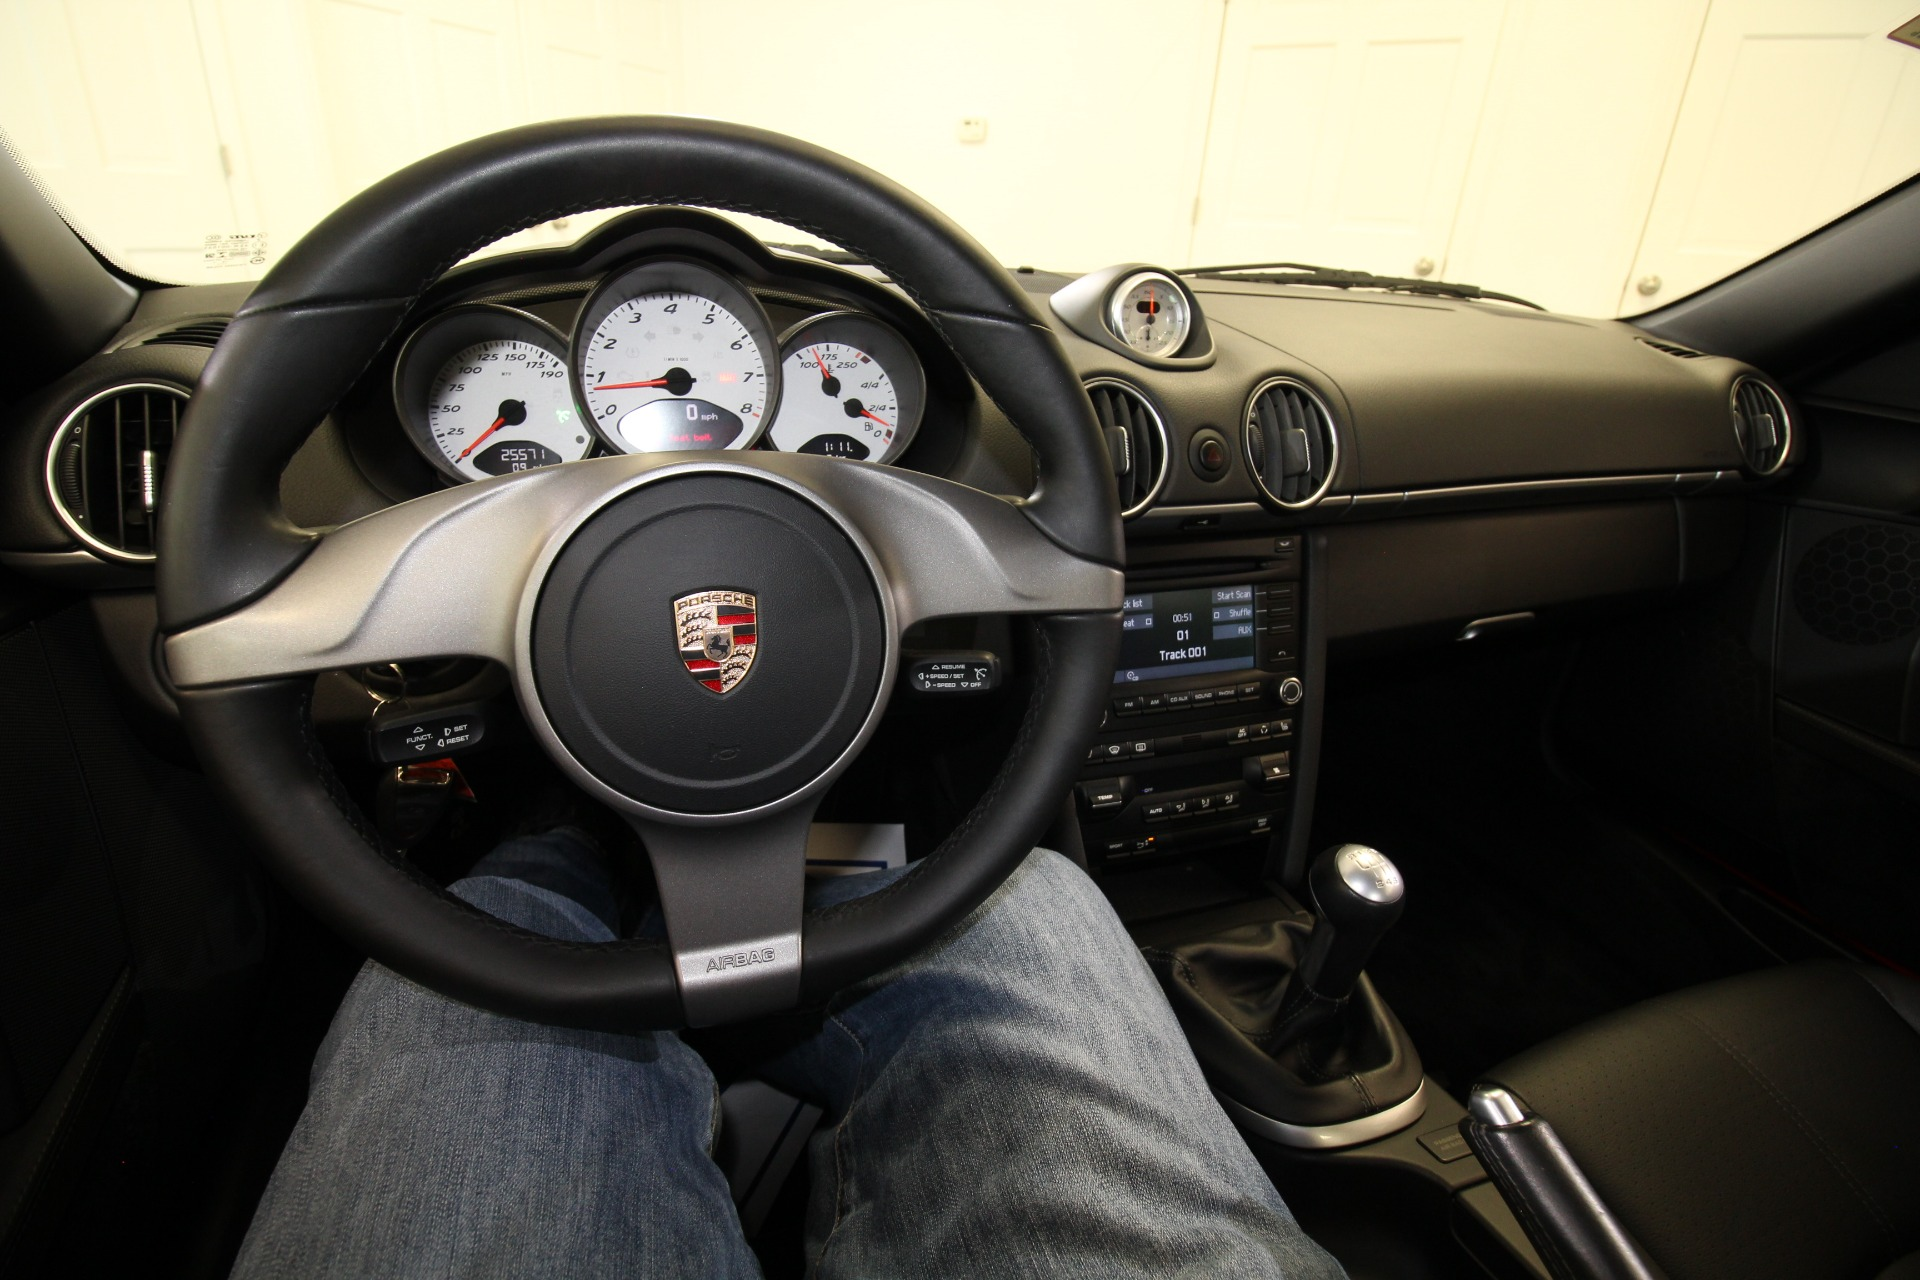 Used 2010 Porsche Cayman S LOCAL CAR SUPERB RARE 6 SPEED MANUAL | Albany, NY